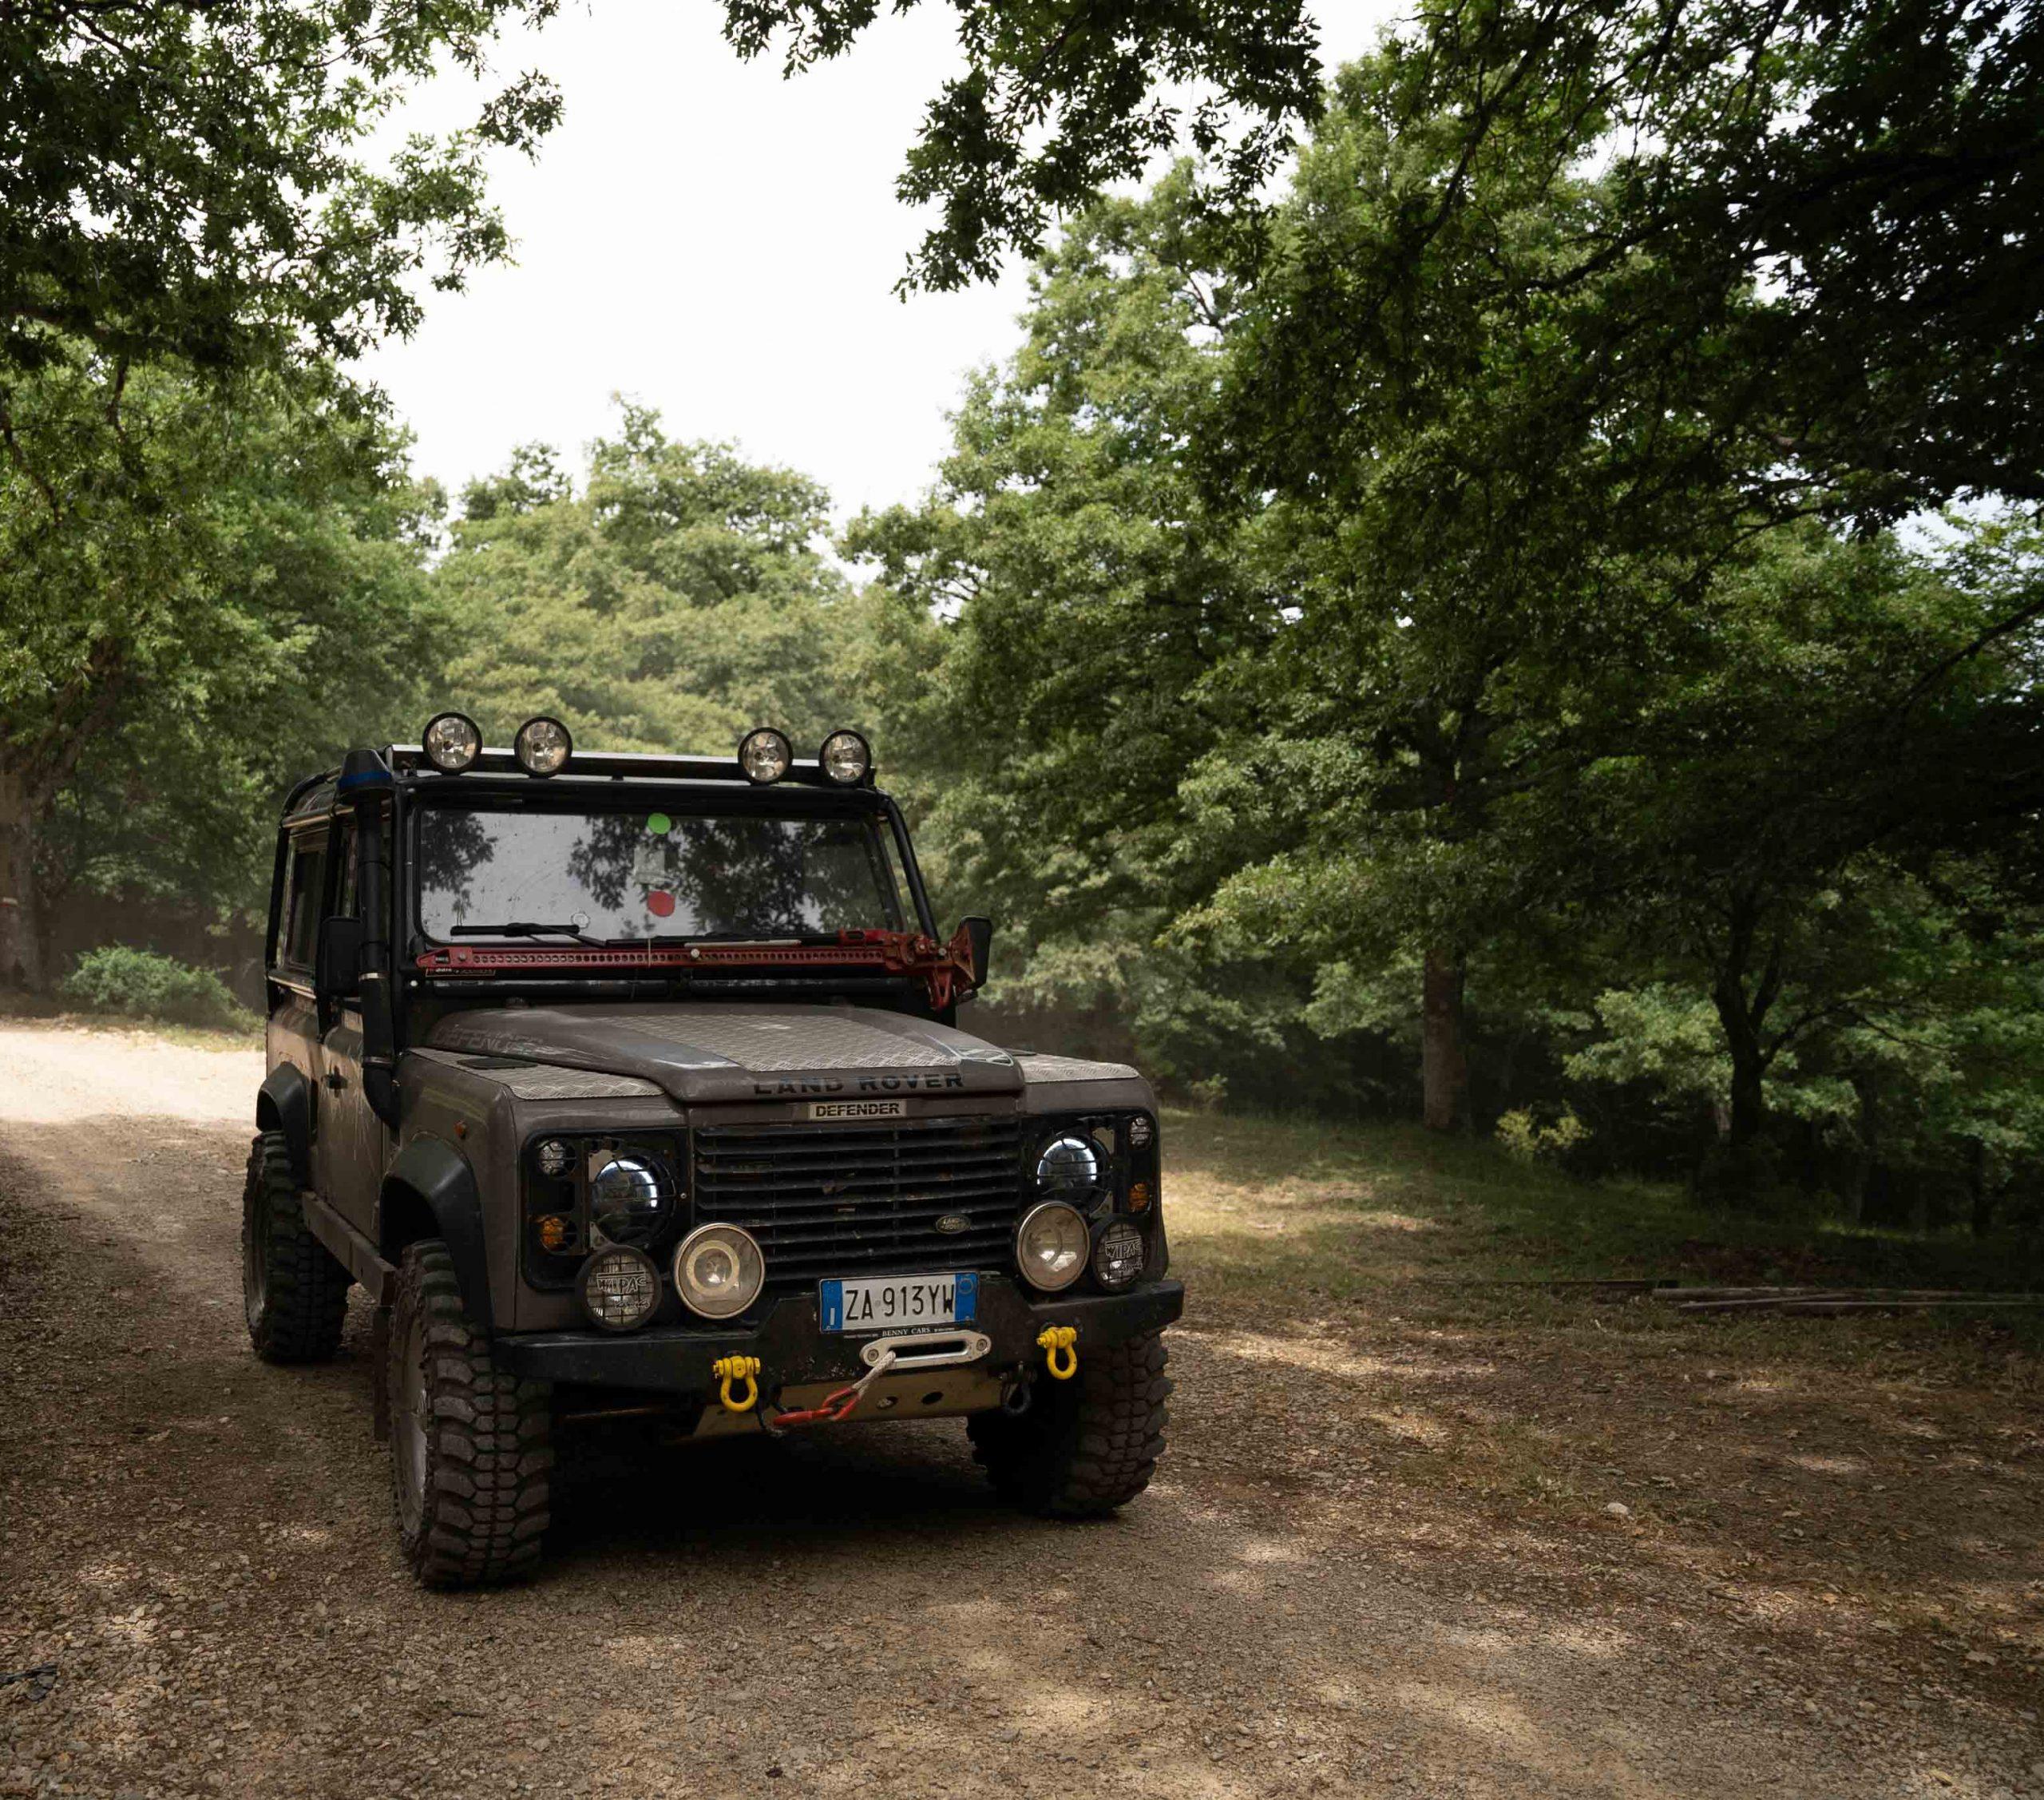 Land_Rover_Tour_Sicilia_2021_Land_Rover_Experience_Italia_-62